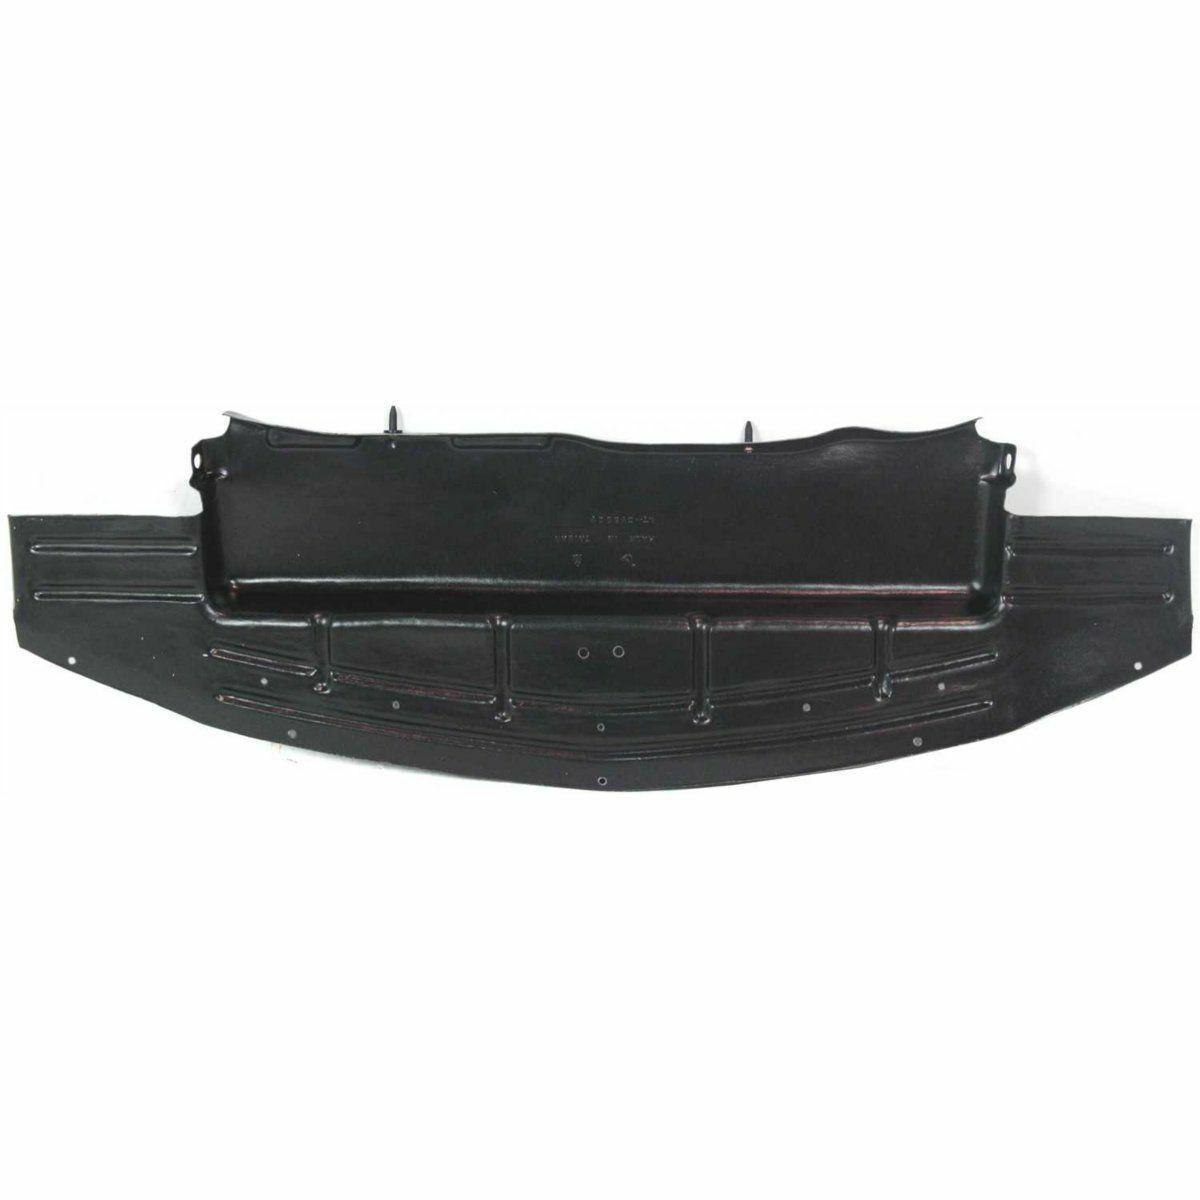 Classic GM1228110 For Chevy Malibu Engine Splash Shield 2008 09 10 11 2012 Center Under Cover 15826166